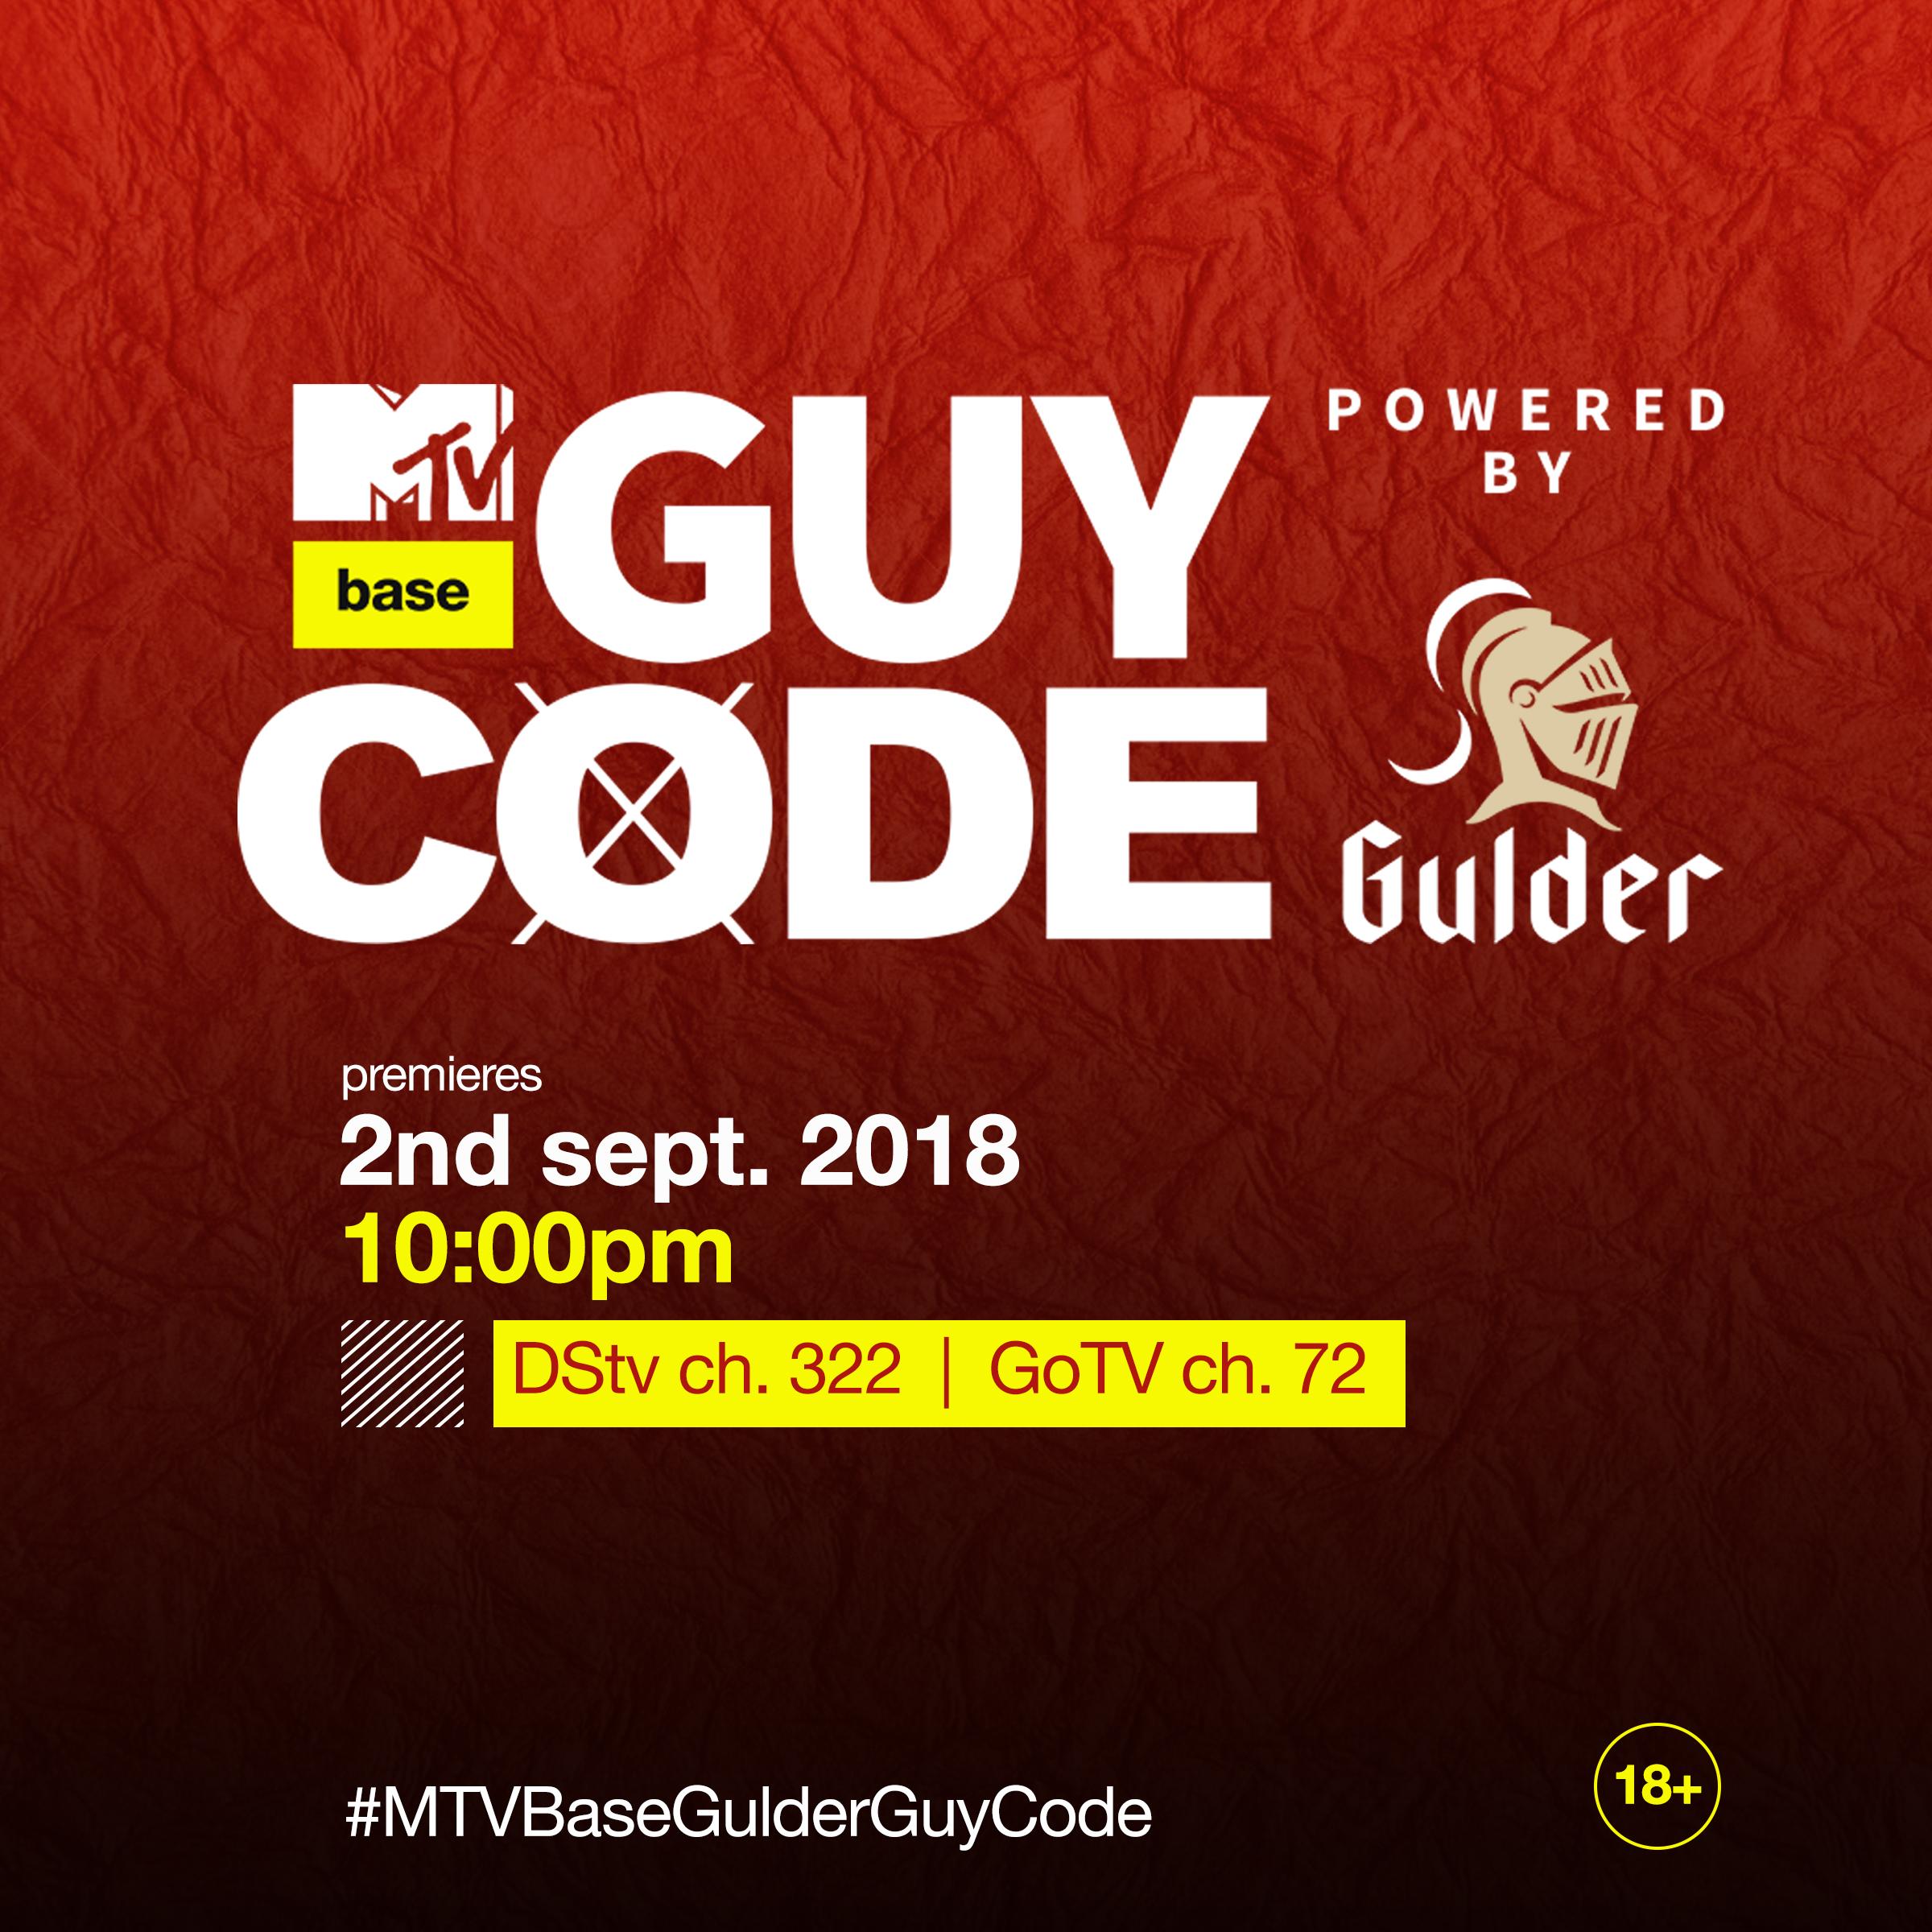 the guy code